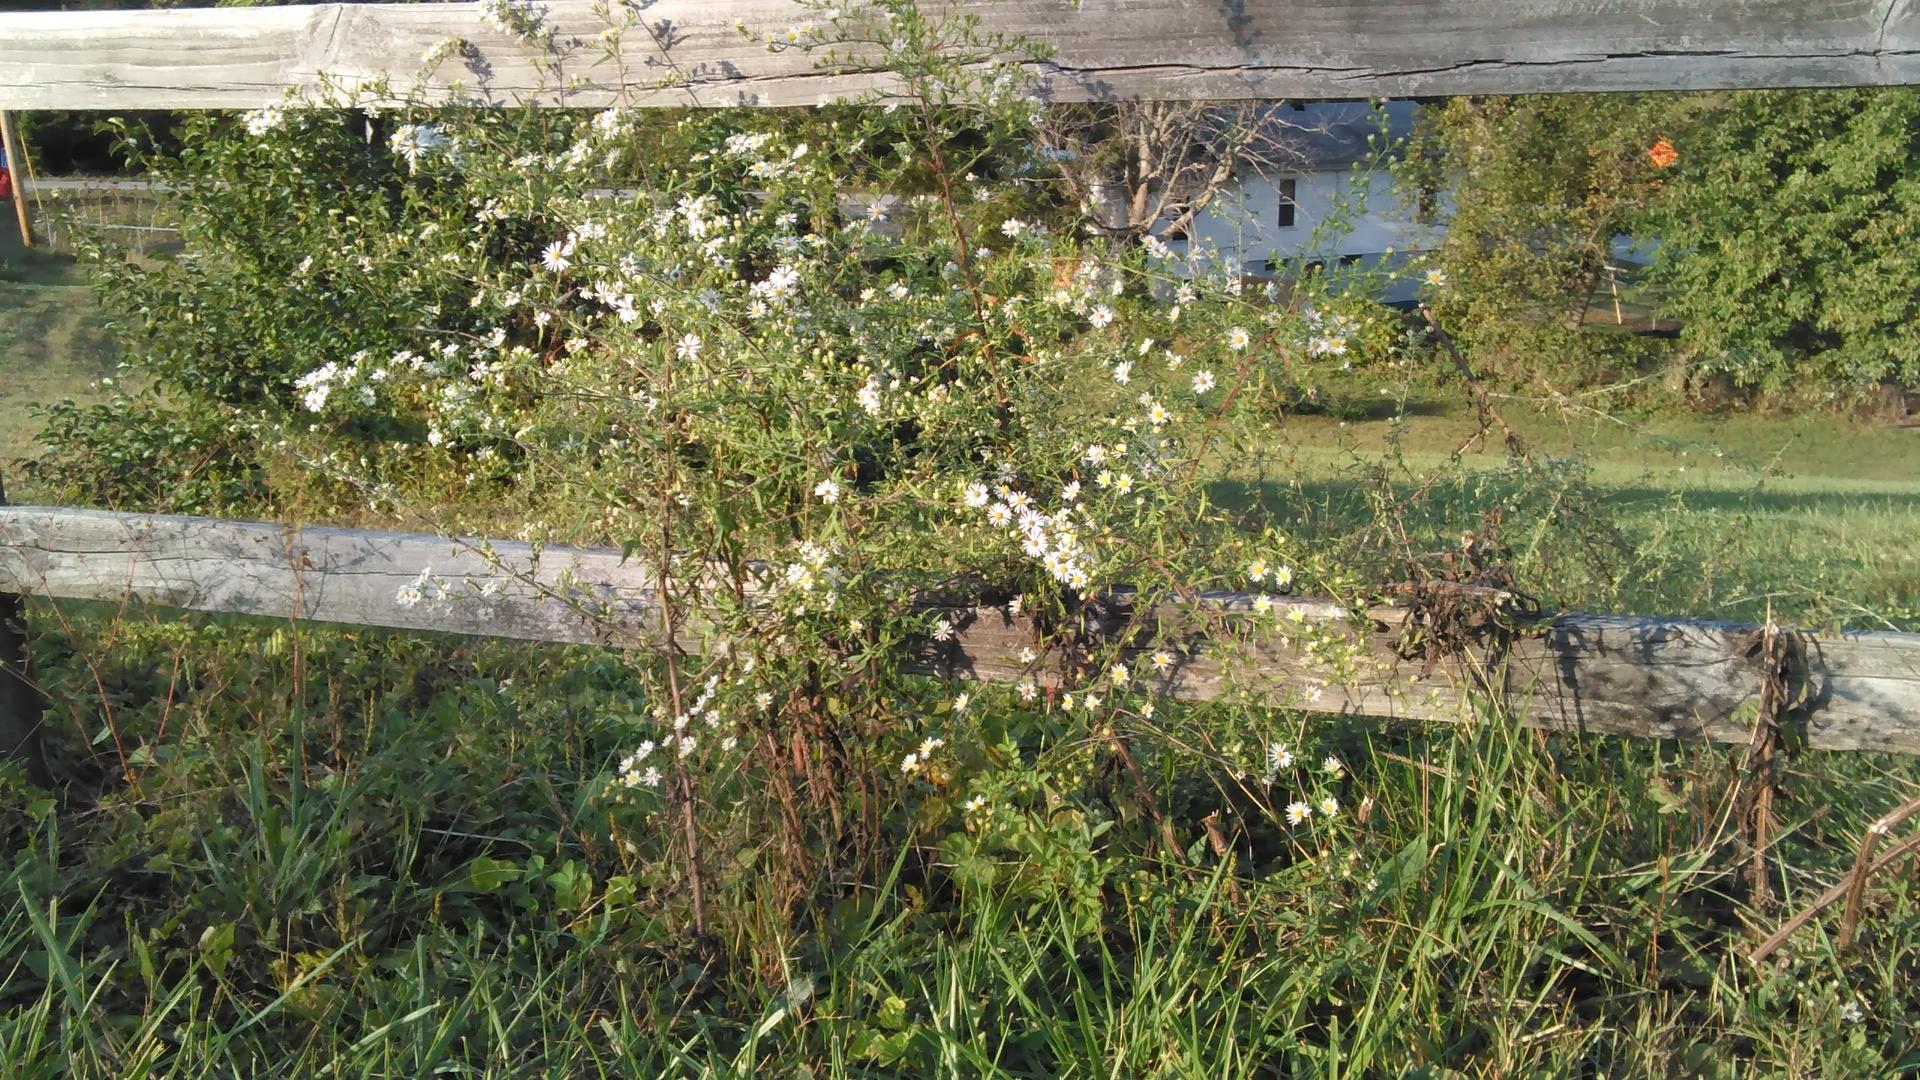 Late summer daisies | codenamesailorearth, countryside, flower, grass